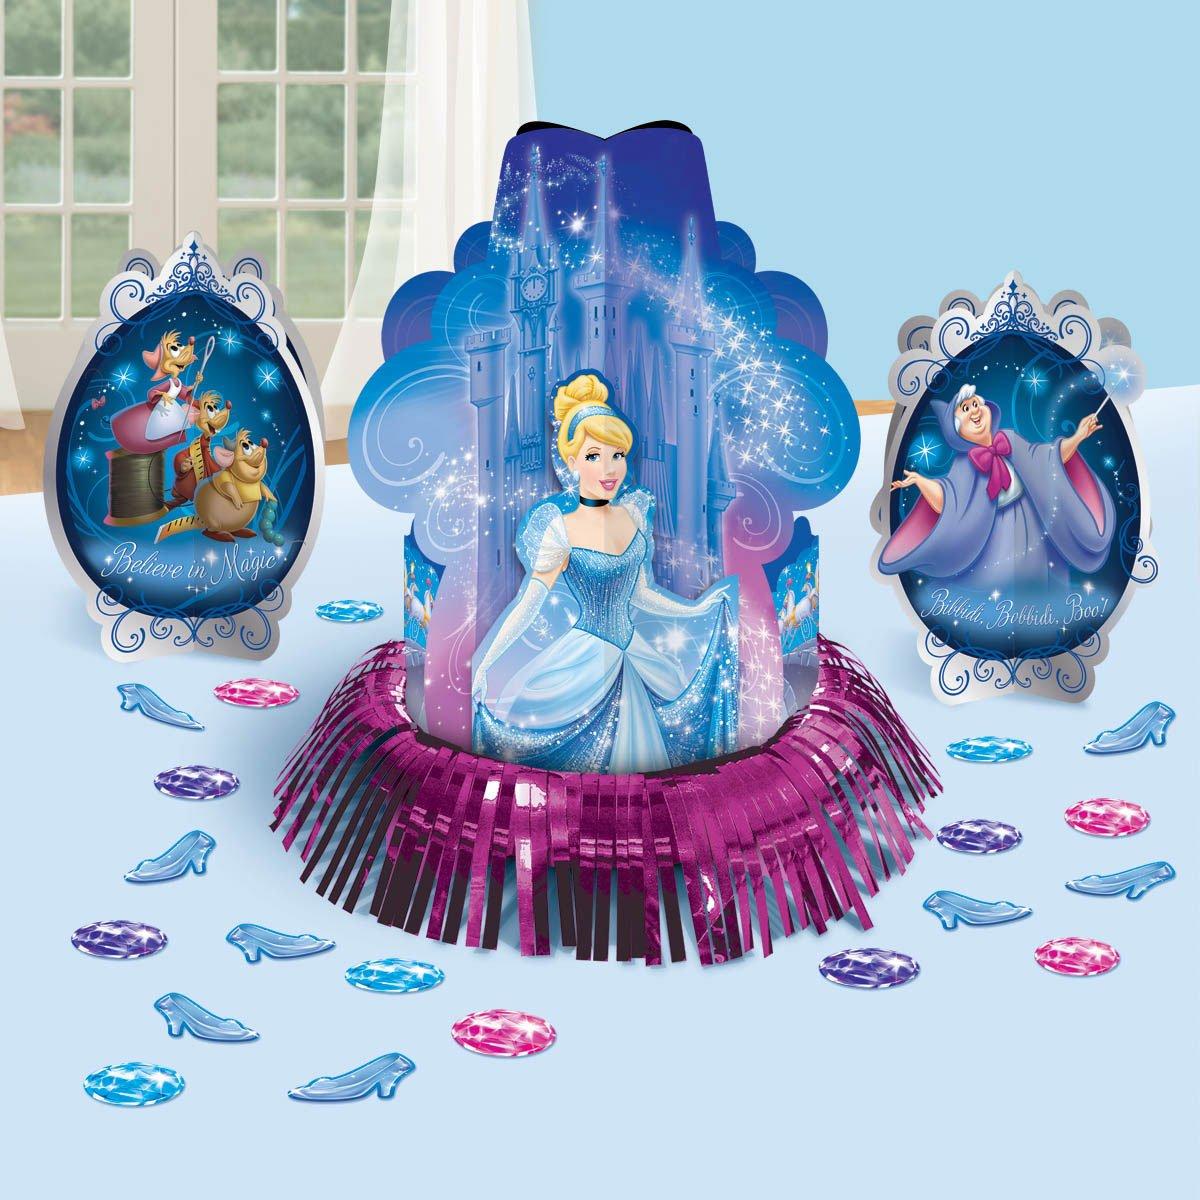 Cinderella Table Decorating Kit (Each) AMSCAN 283840